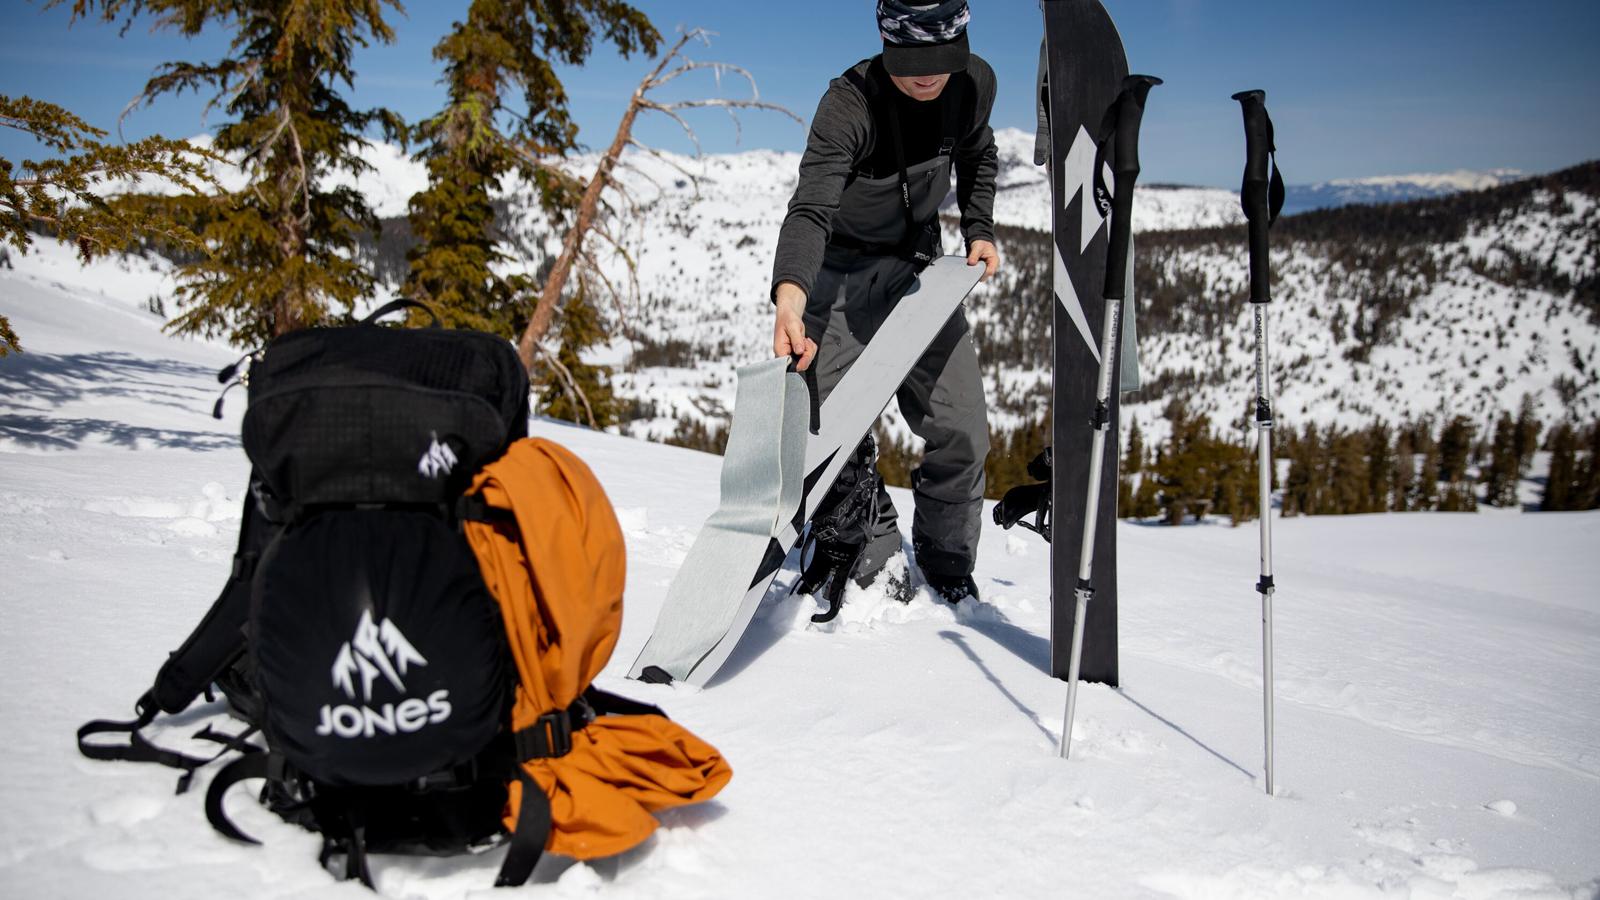 Jones 21/22 Technical Snow Backpacks Preview